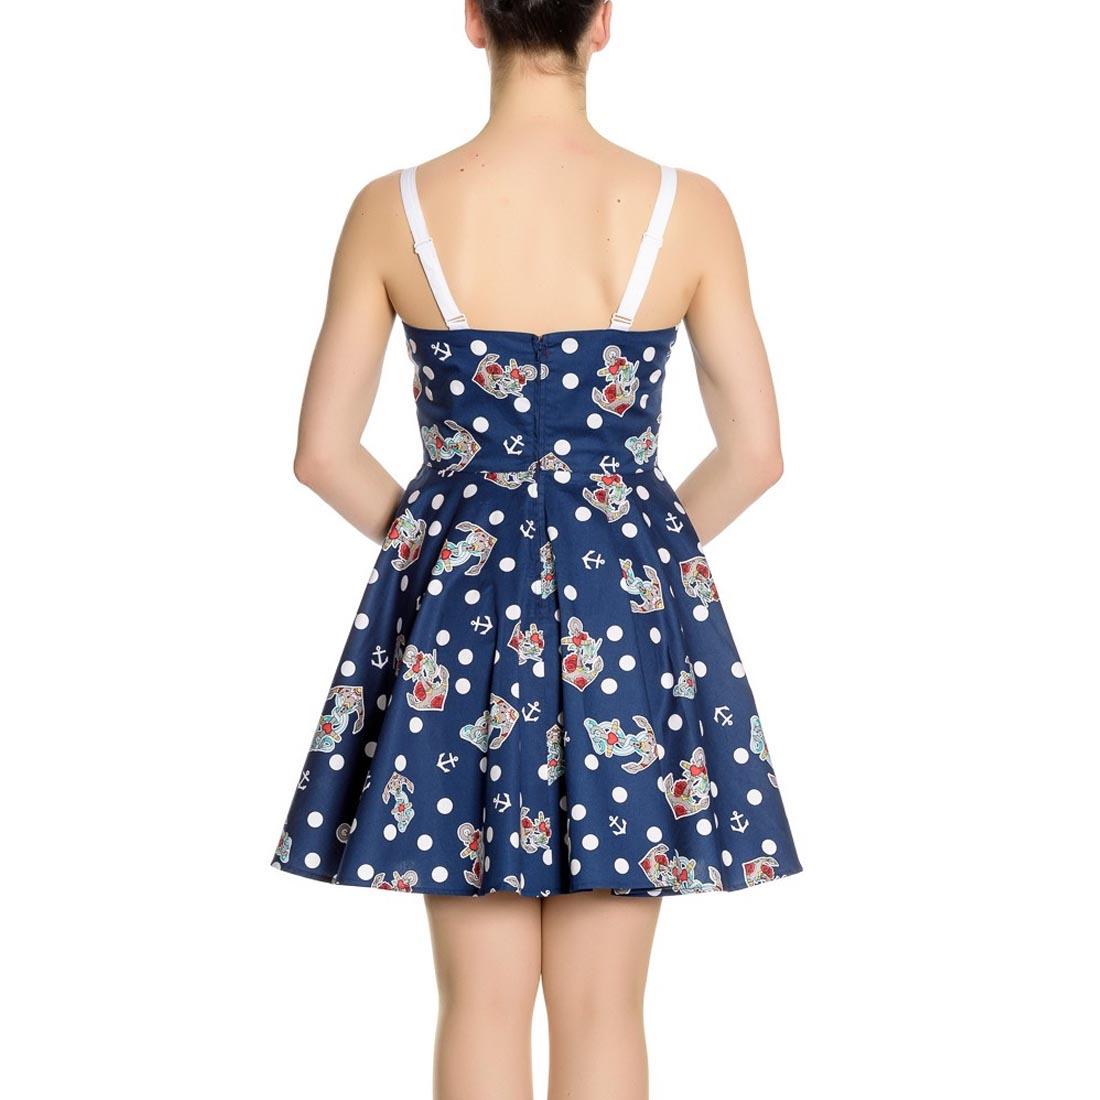 Hell-Bunny-Navy-Blue-50s-Nautical-Mini-Dress-OCEANA-Polka-Dot-All-Sizes thumbnail 5